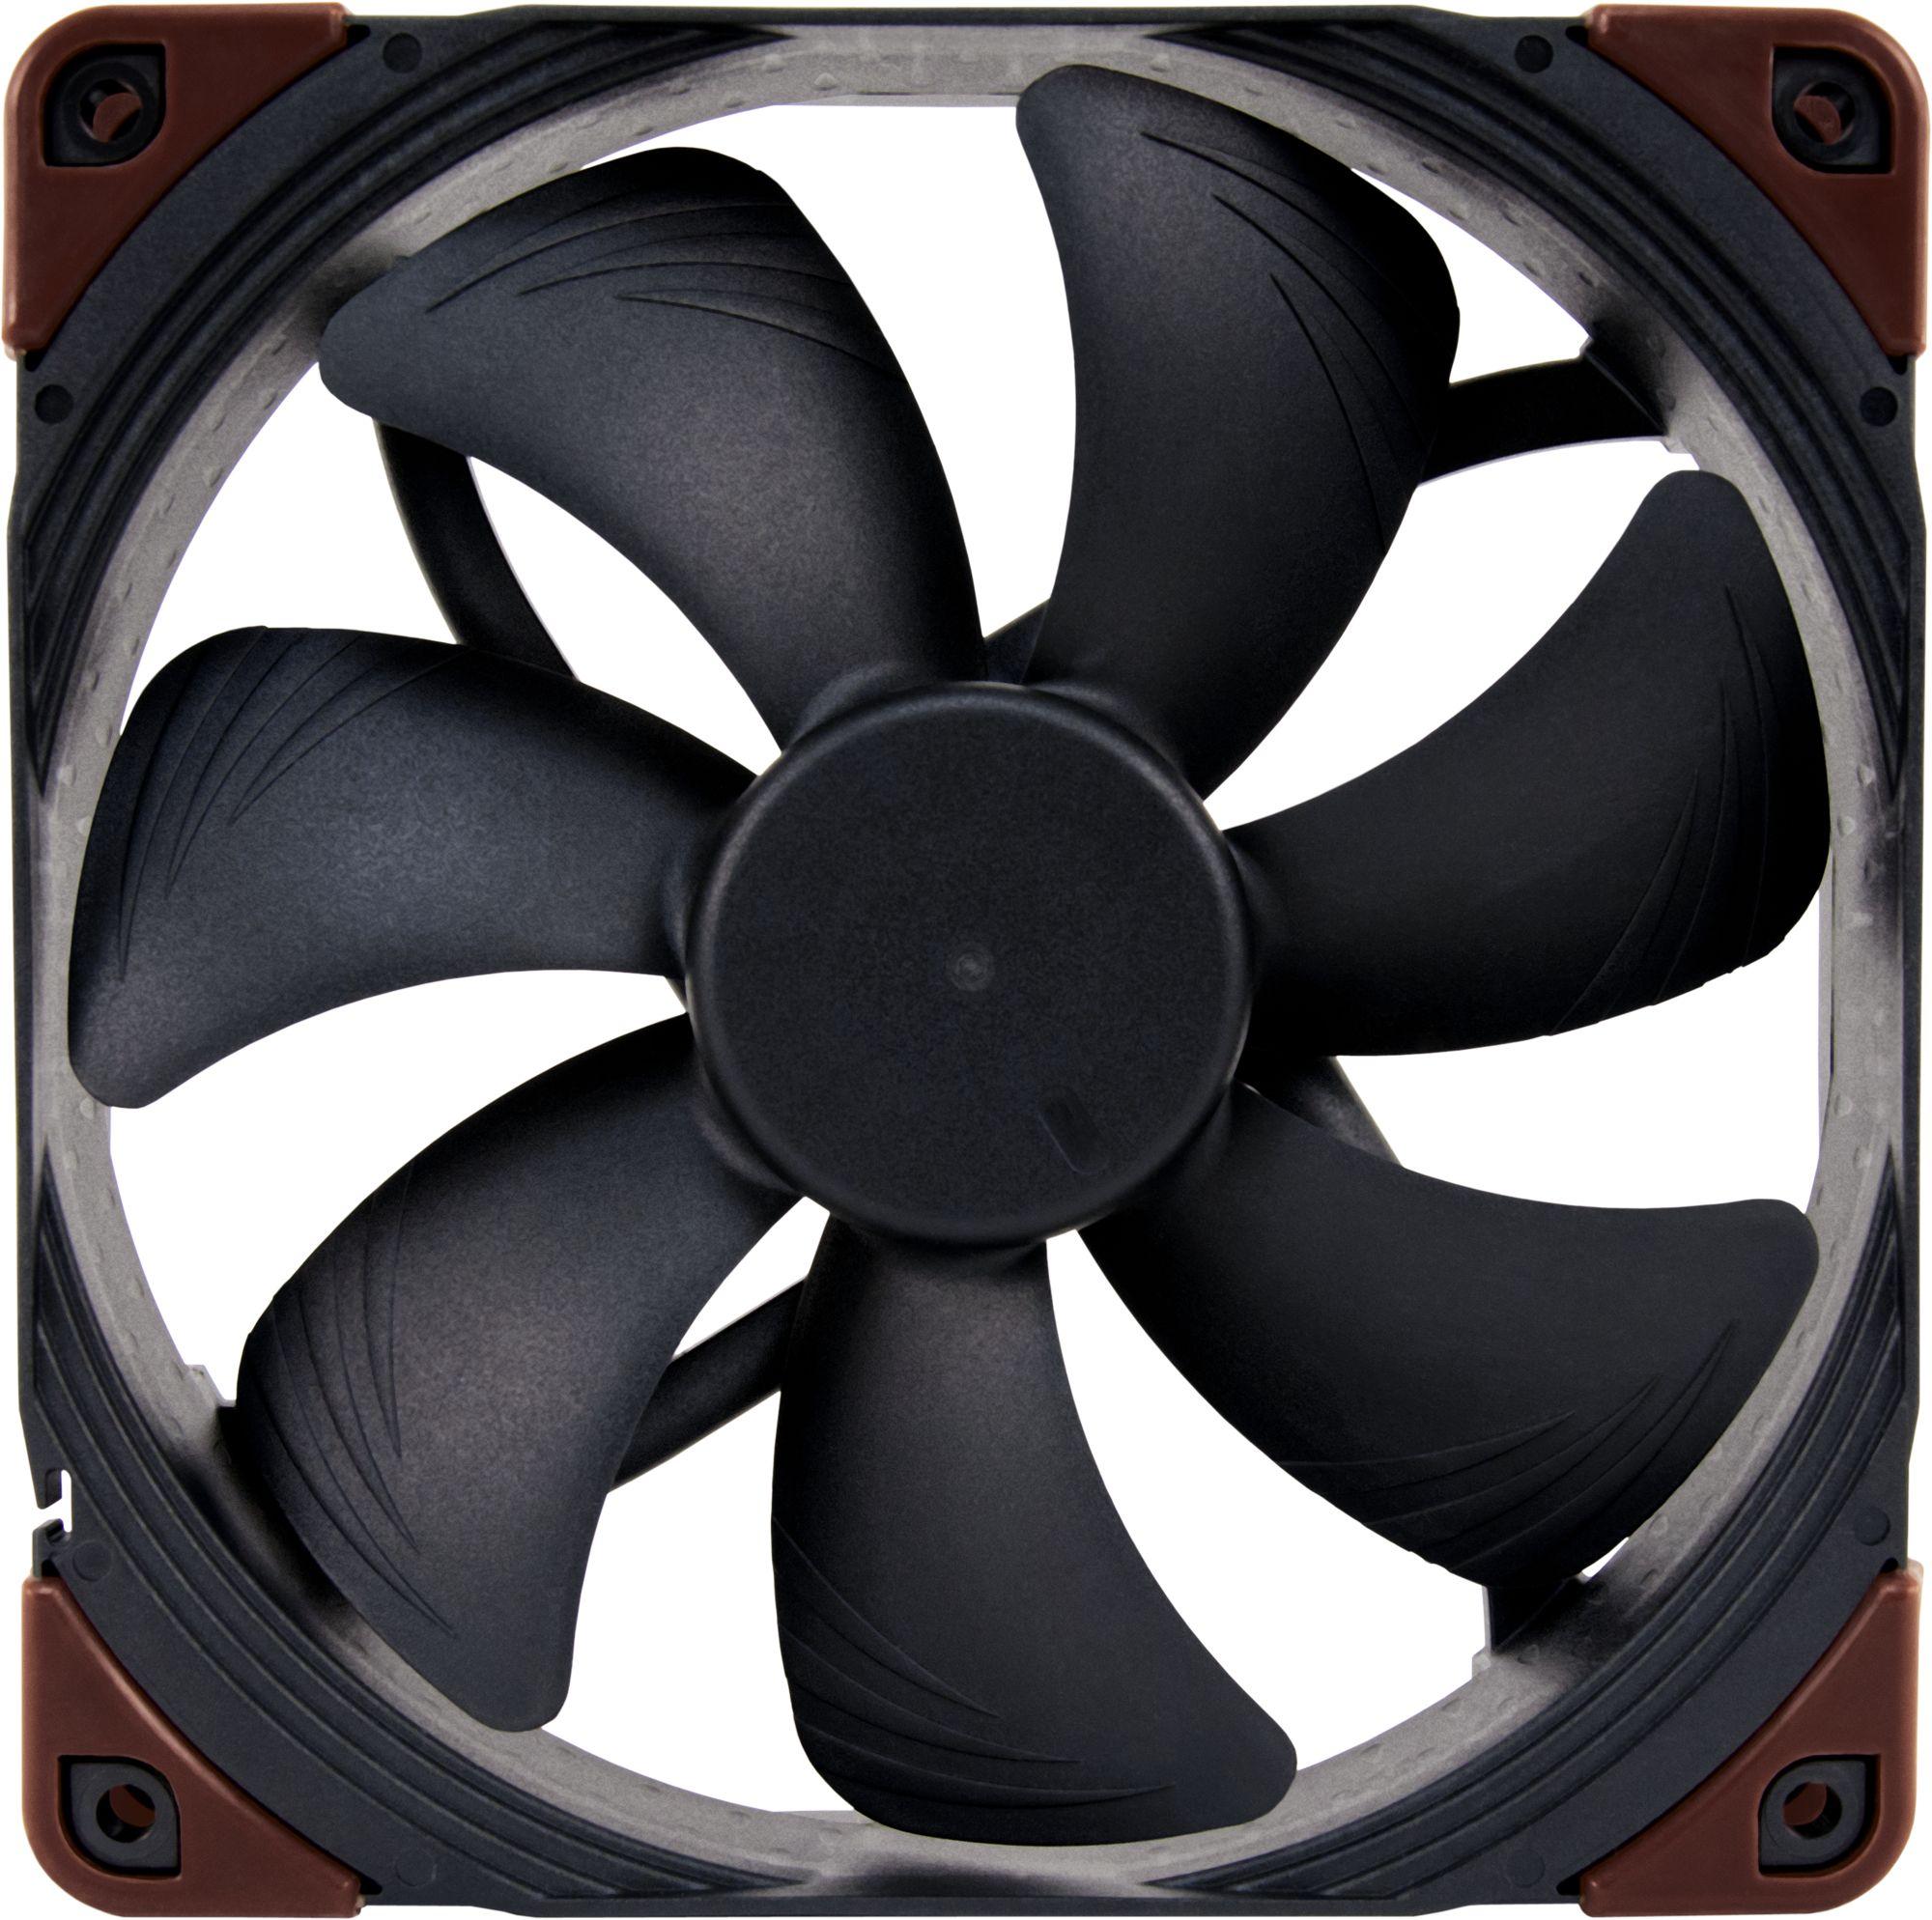 Nf A14 Industrialppc 3000rpm Pwm 140mm High Performance Fan